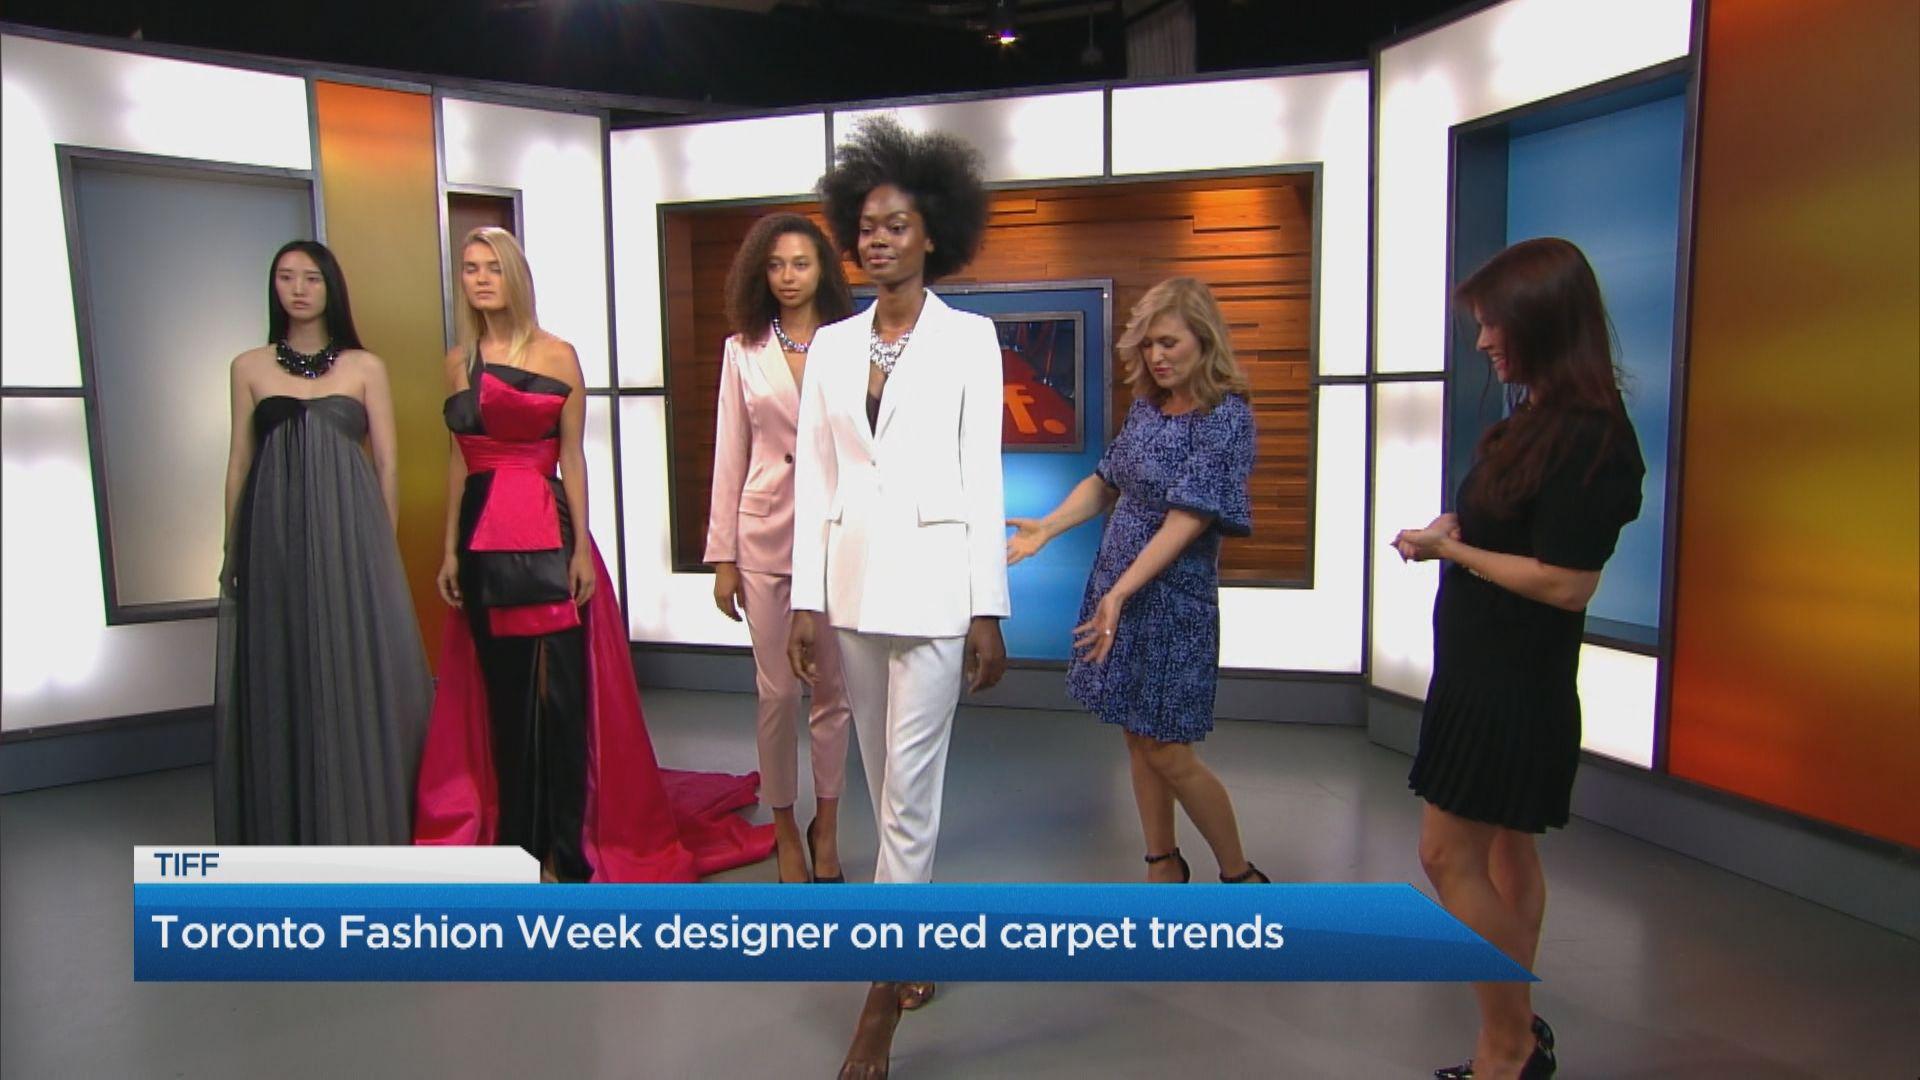 Designer Jordan Stewart S Top Tiff Looks Watch News Videos Online